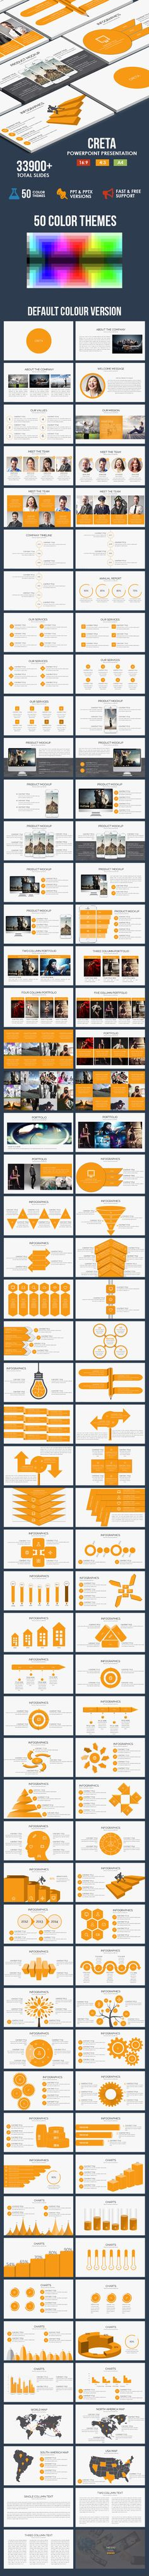 Creta - Powerpoint Presentation Template - #Business #PowerPoint #Templates Download here: https://graphicriver.net/item/creta-powerpoint-presentation-template/15913321?ref=alena994